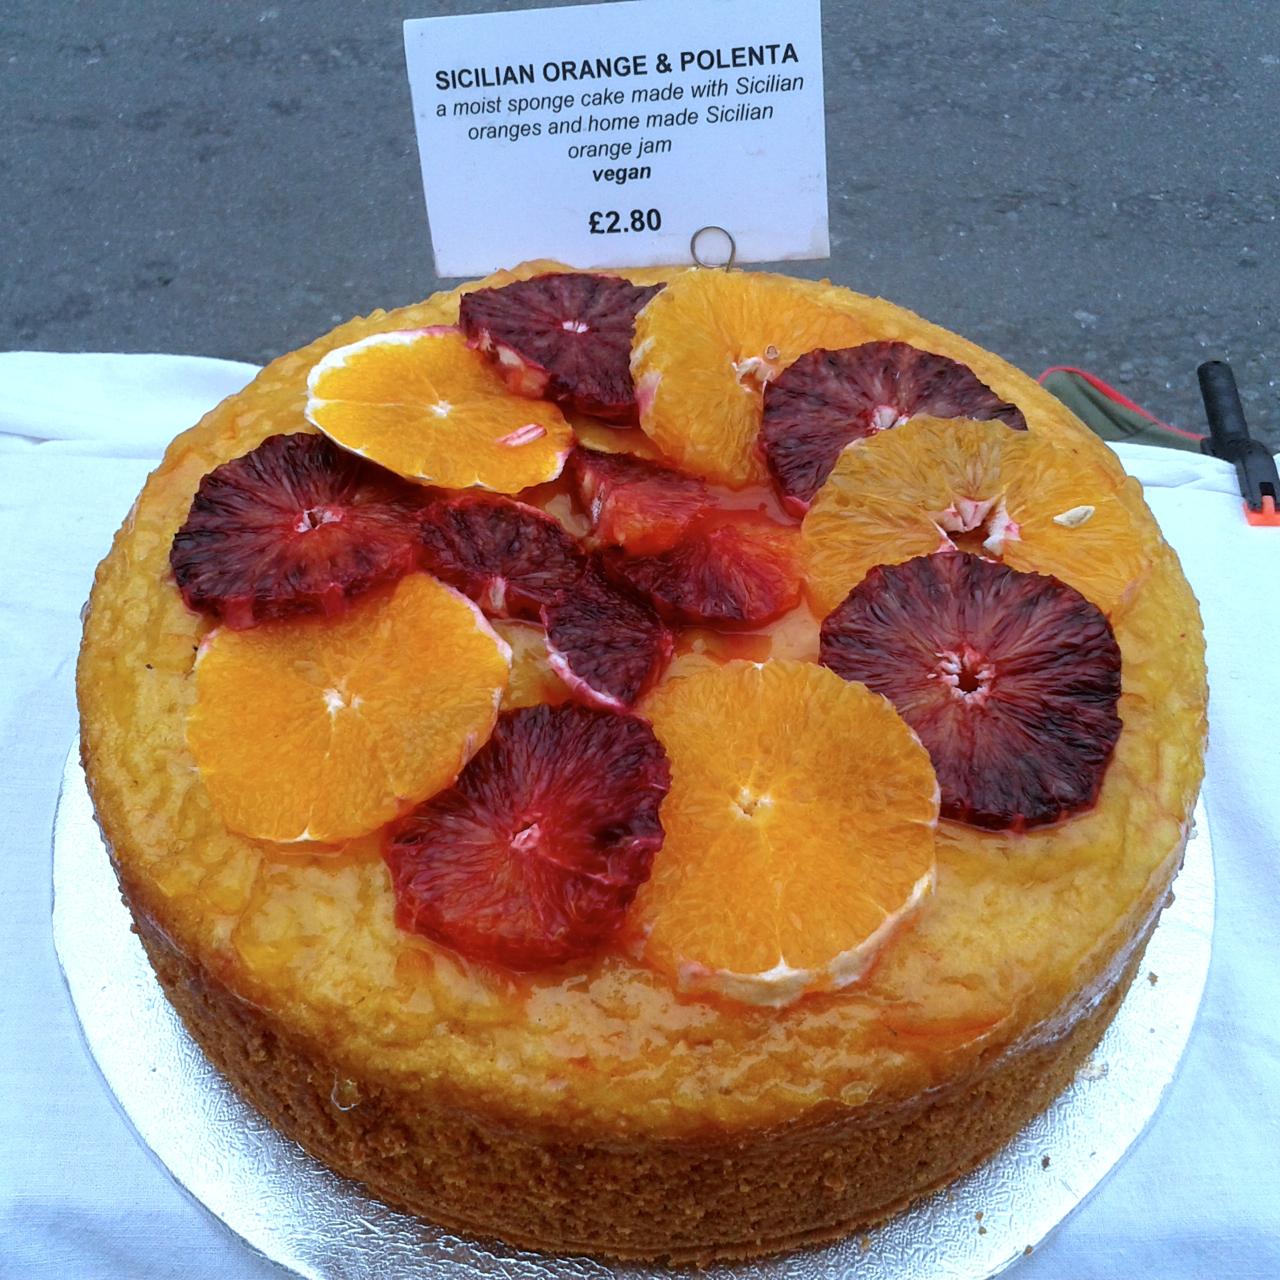 https://i0.wp.com/fatgayvegan.com/wp-content/uploads/2014/06/polenta-cake.jpg?fit=1280%2C1280